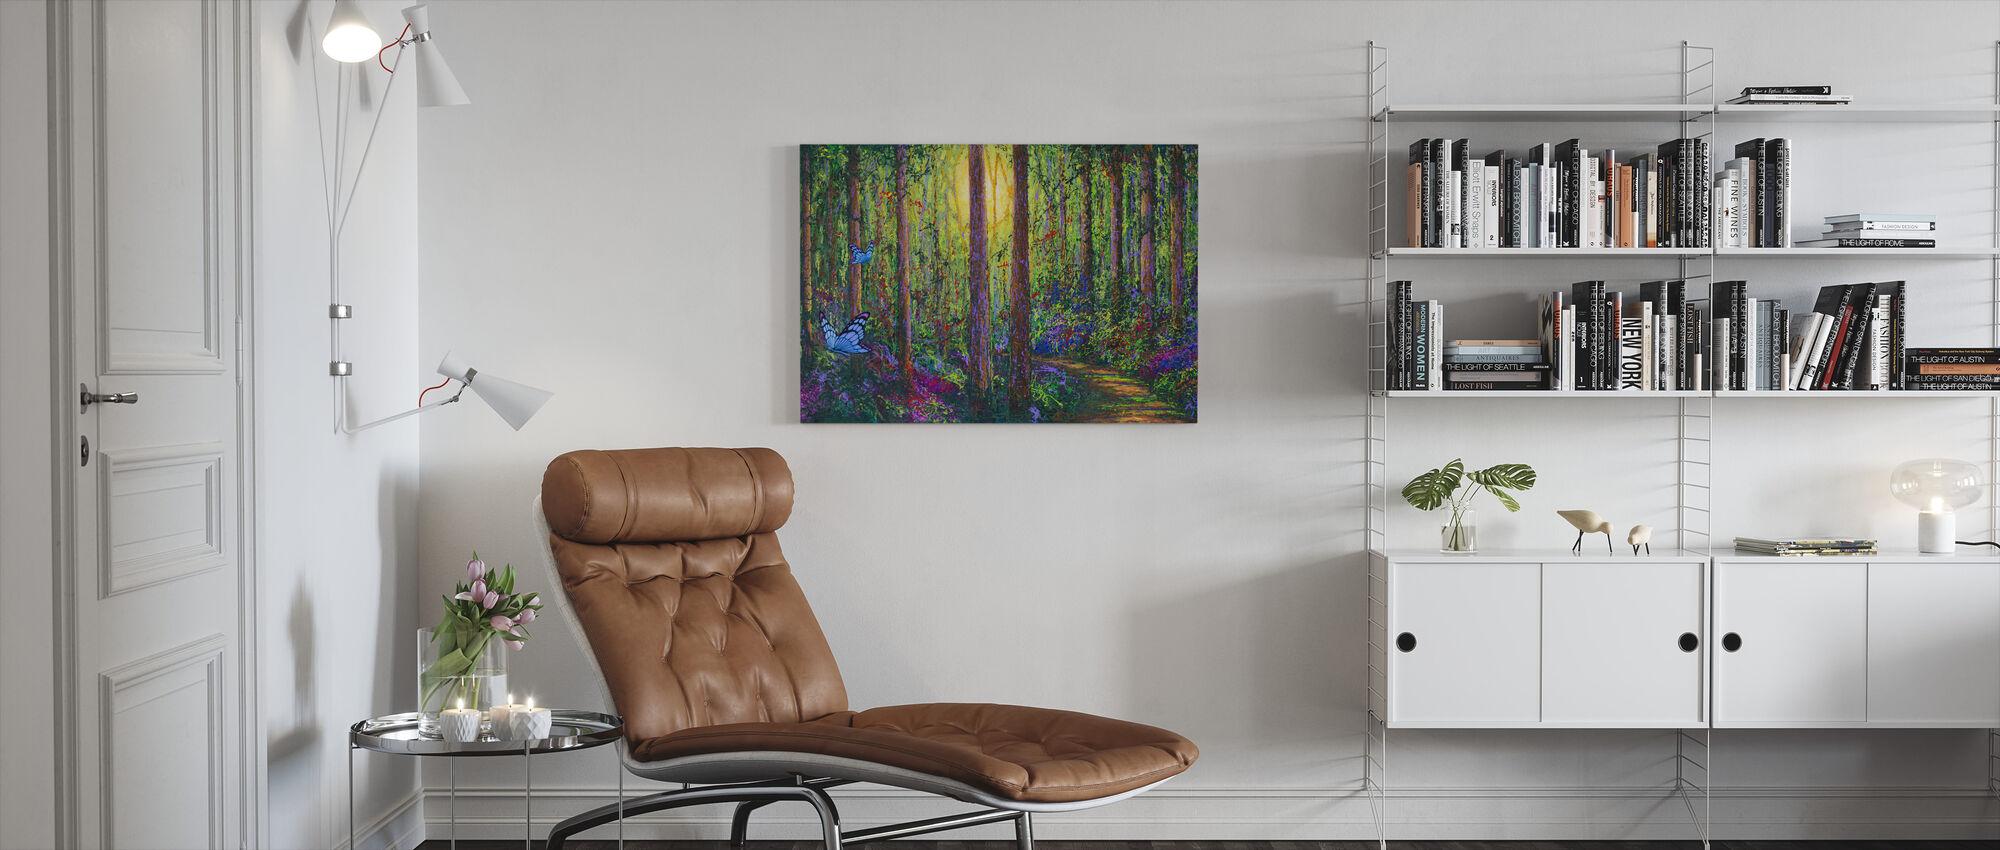 Skogsfjärilar - Canvastavla - Vardagsrum